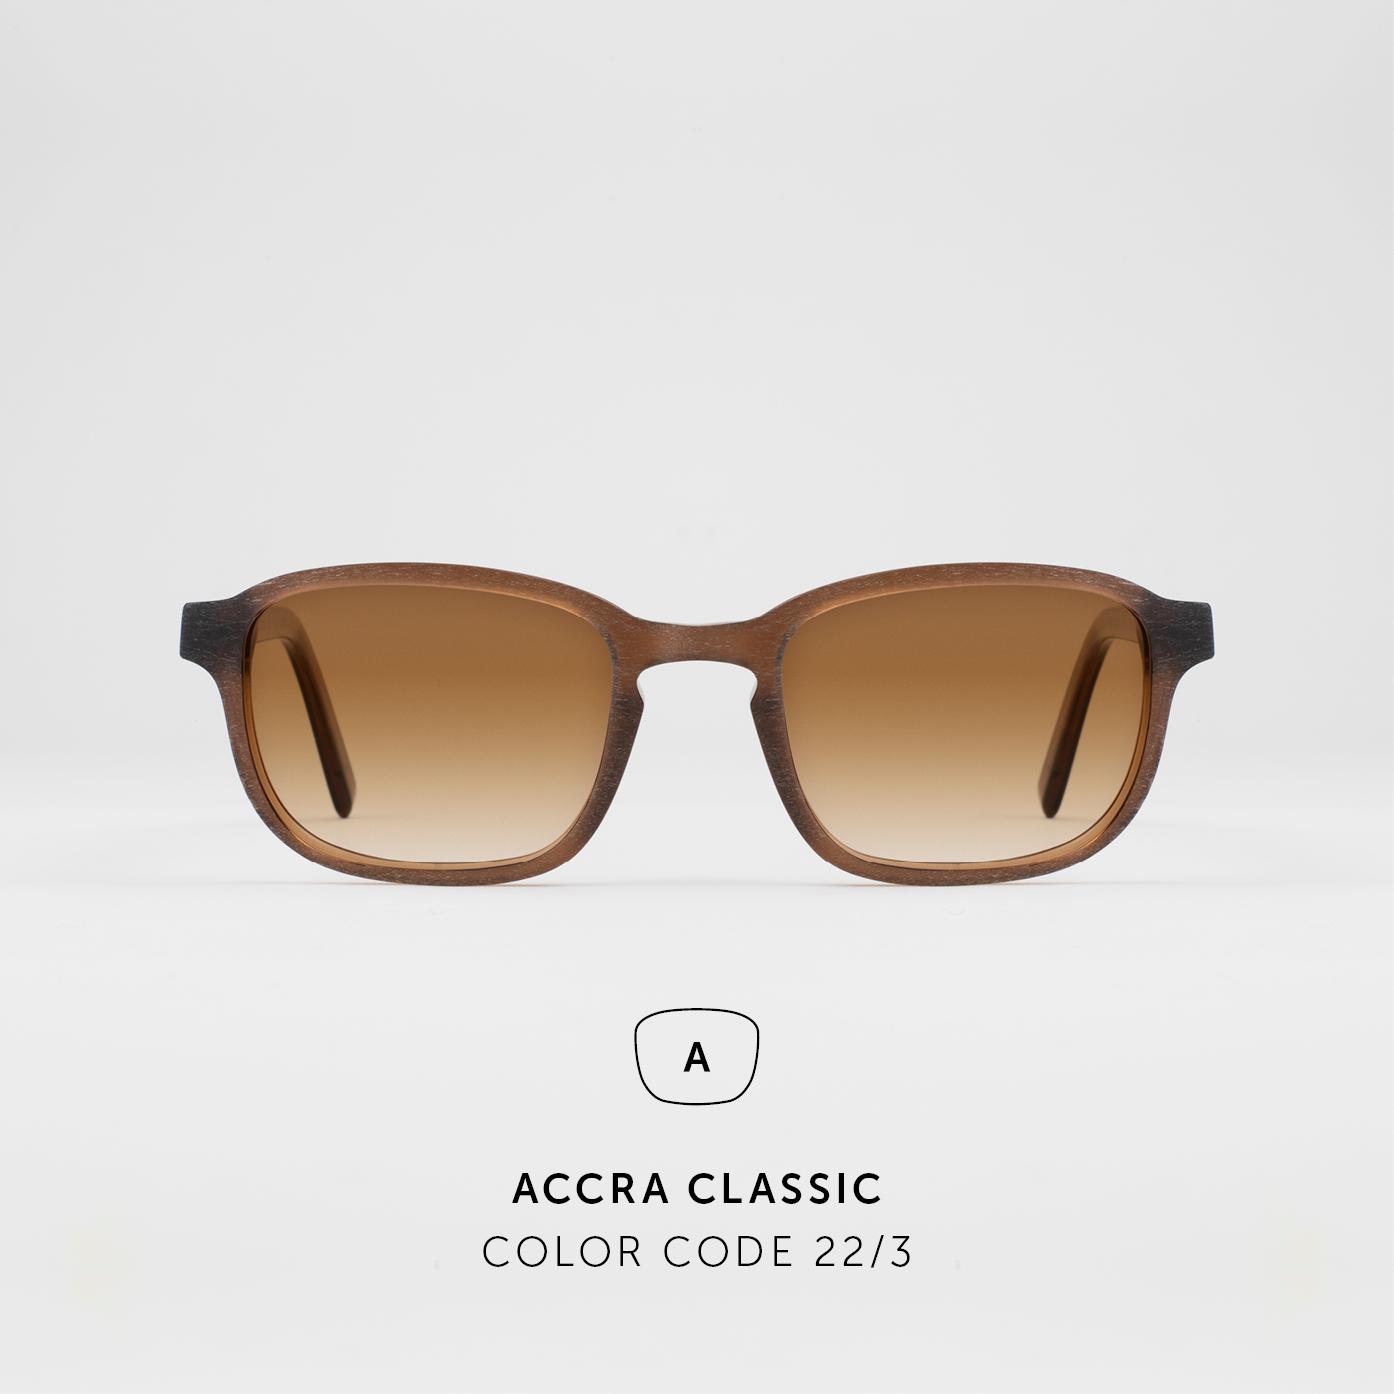 AccraClassic59.jpg